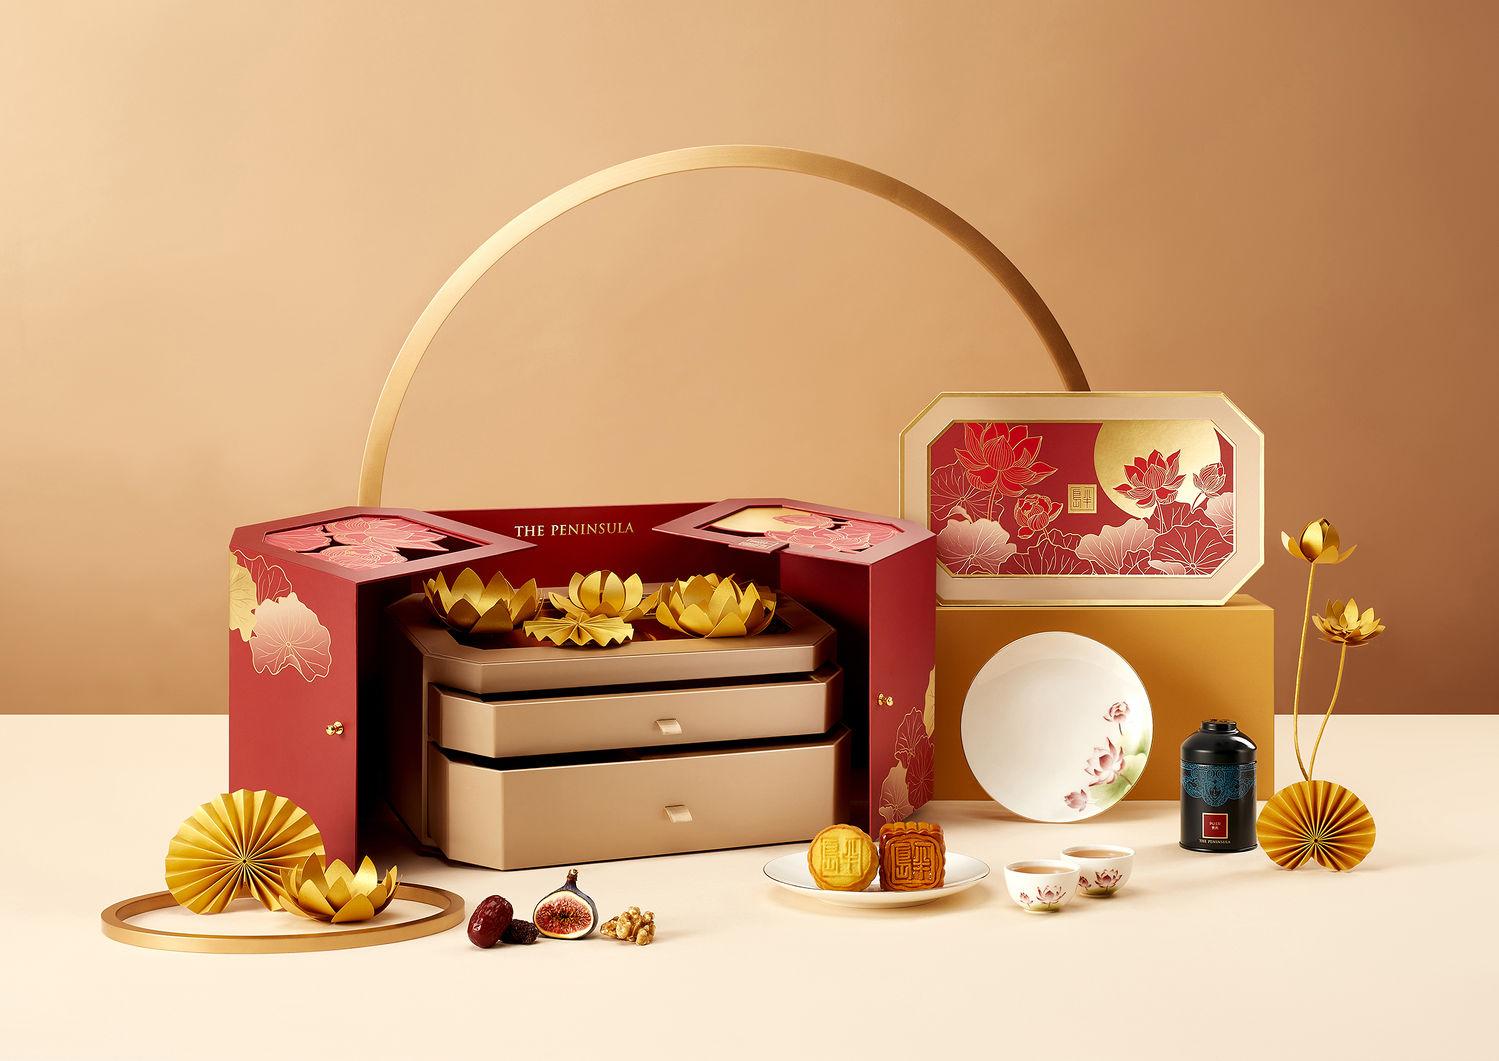 The Peninsula Star Chef Moon Gazing Gift Box Star Chef Mooncake Gift Box - THE EDGE SINGAPORE